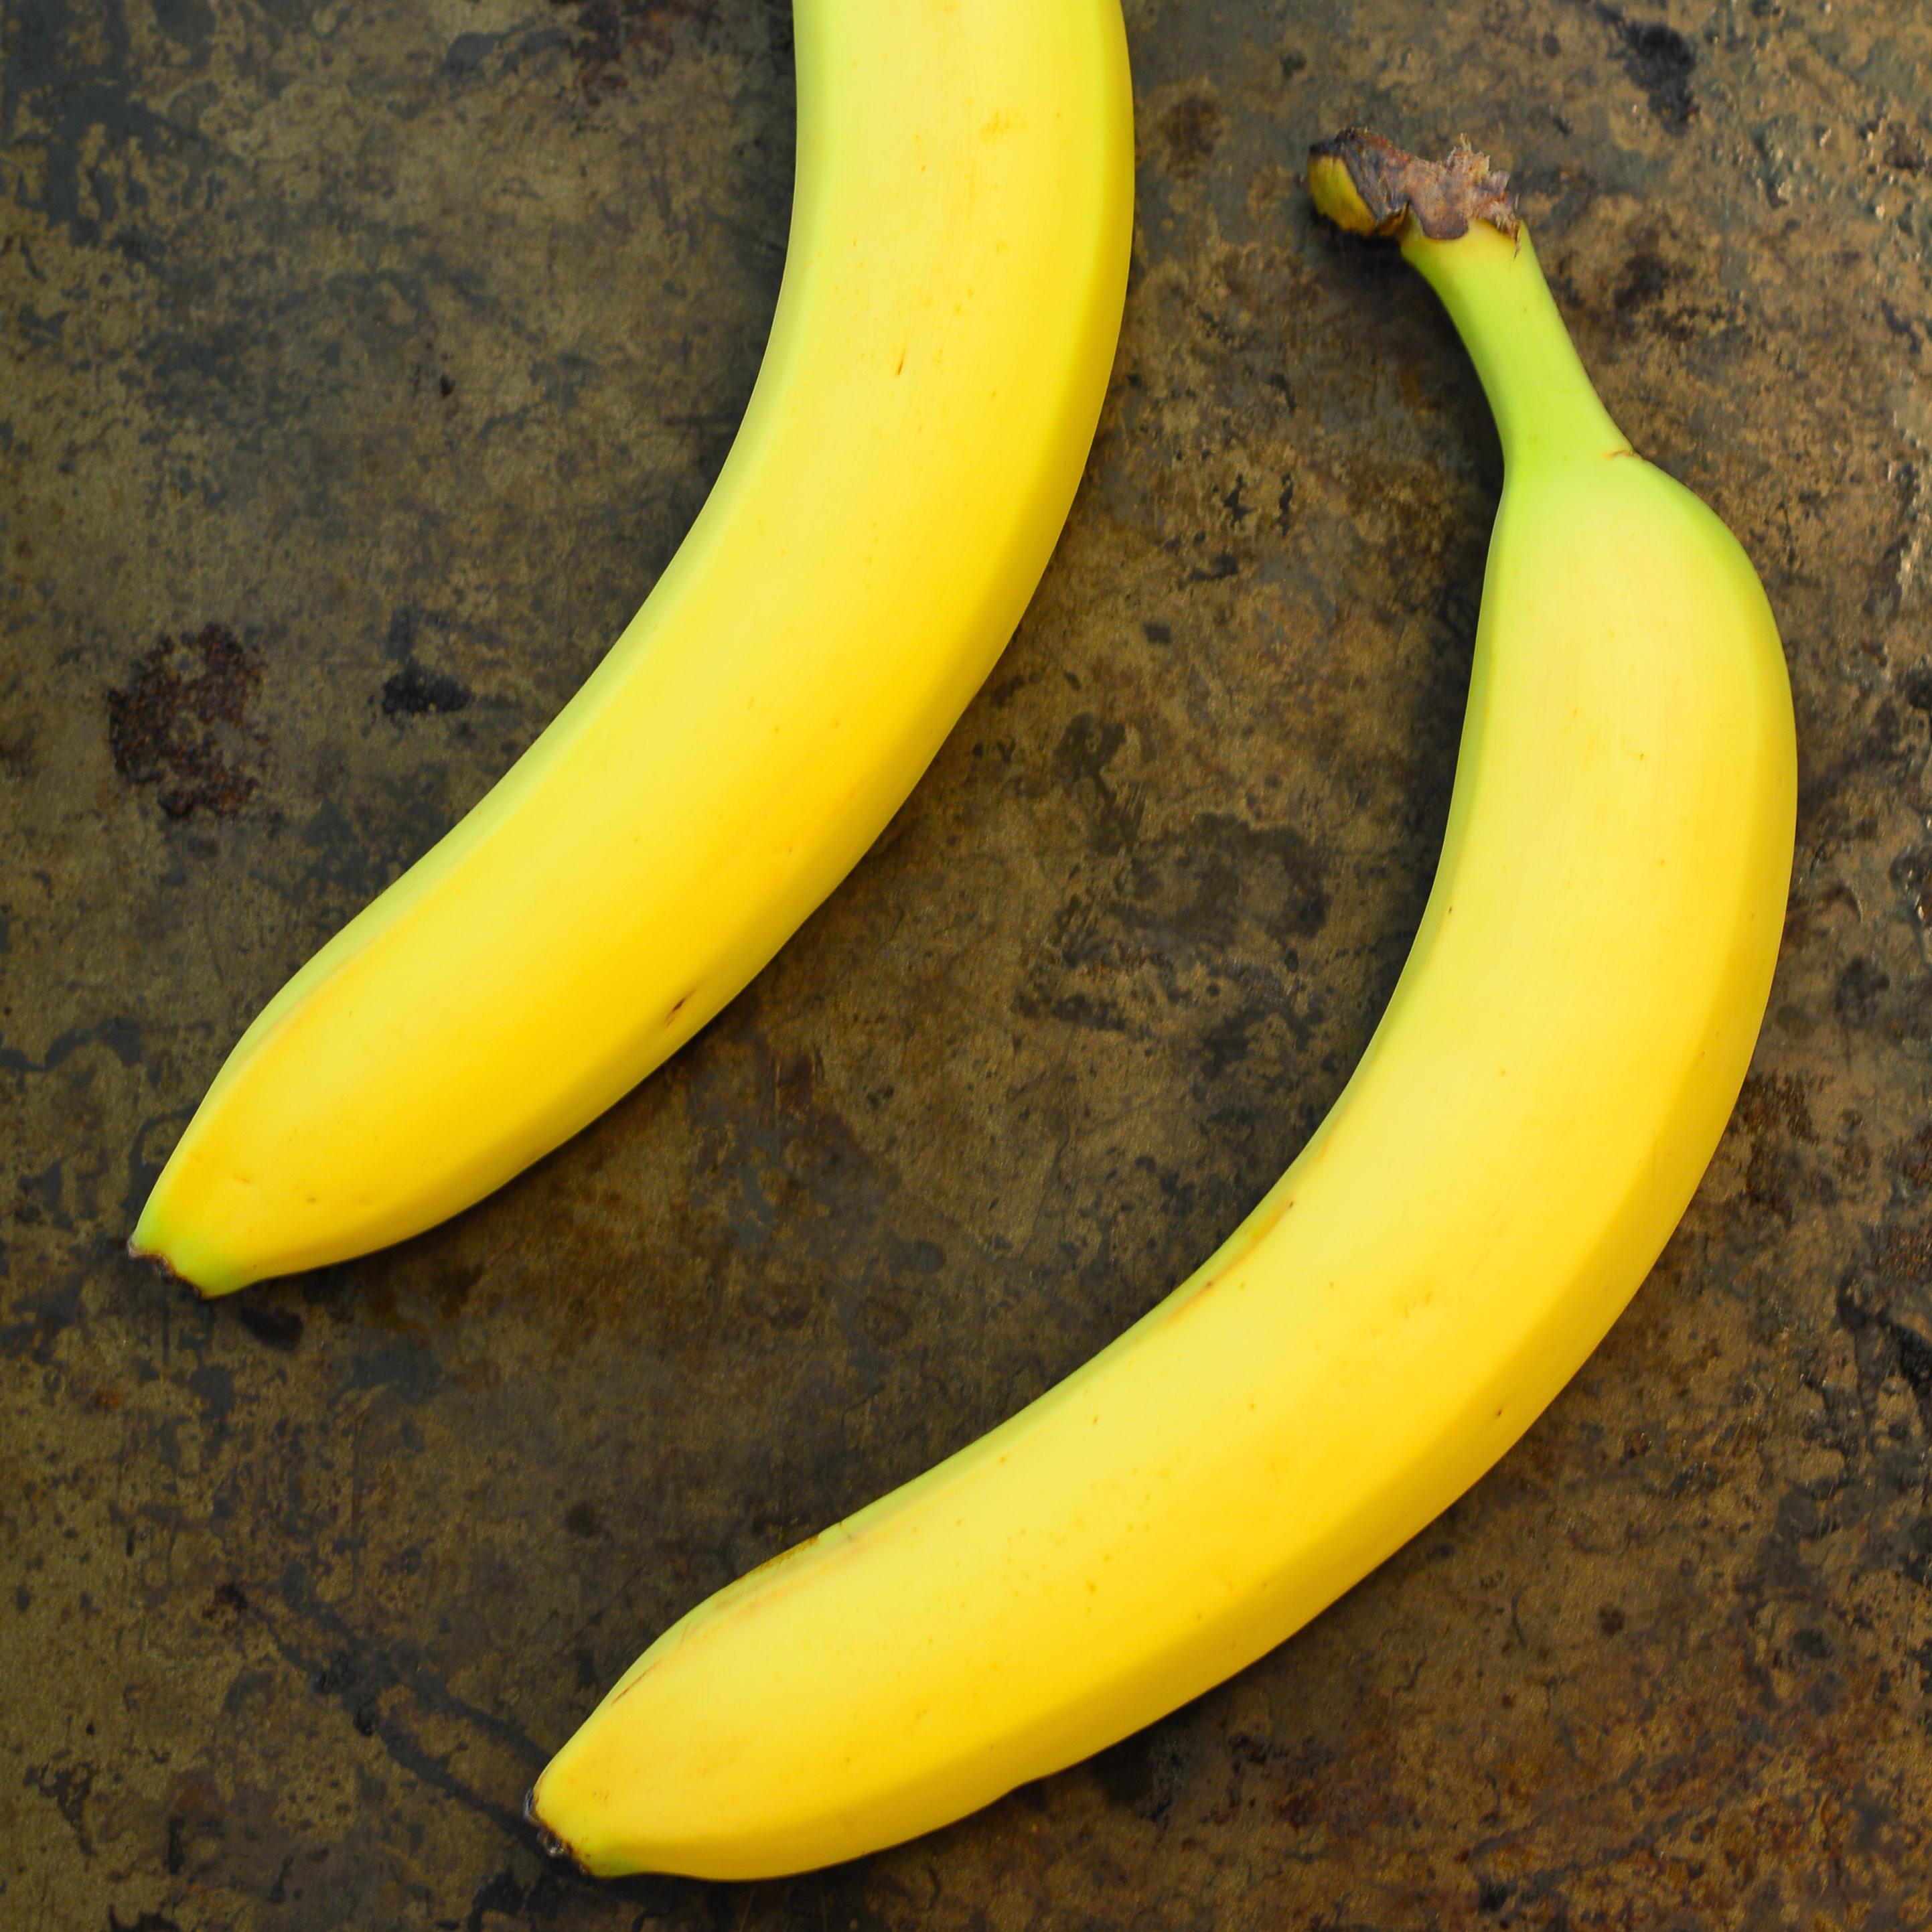 Instant Ripe Bananas - The Lemon Press